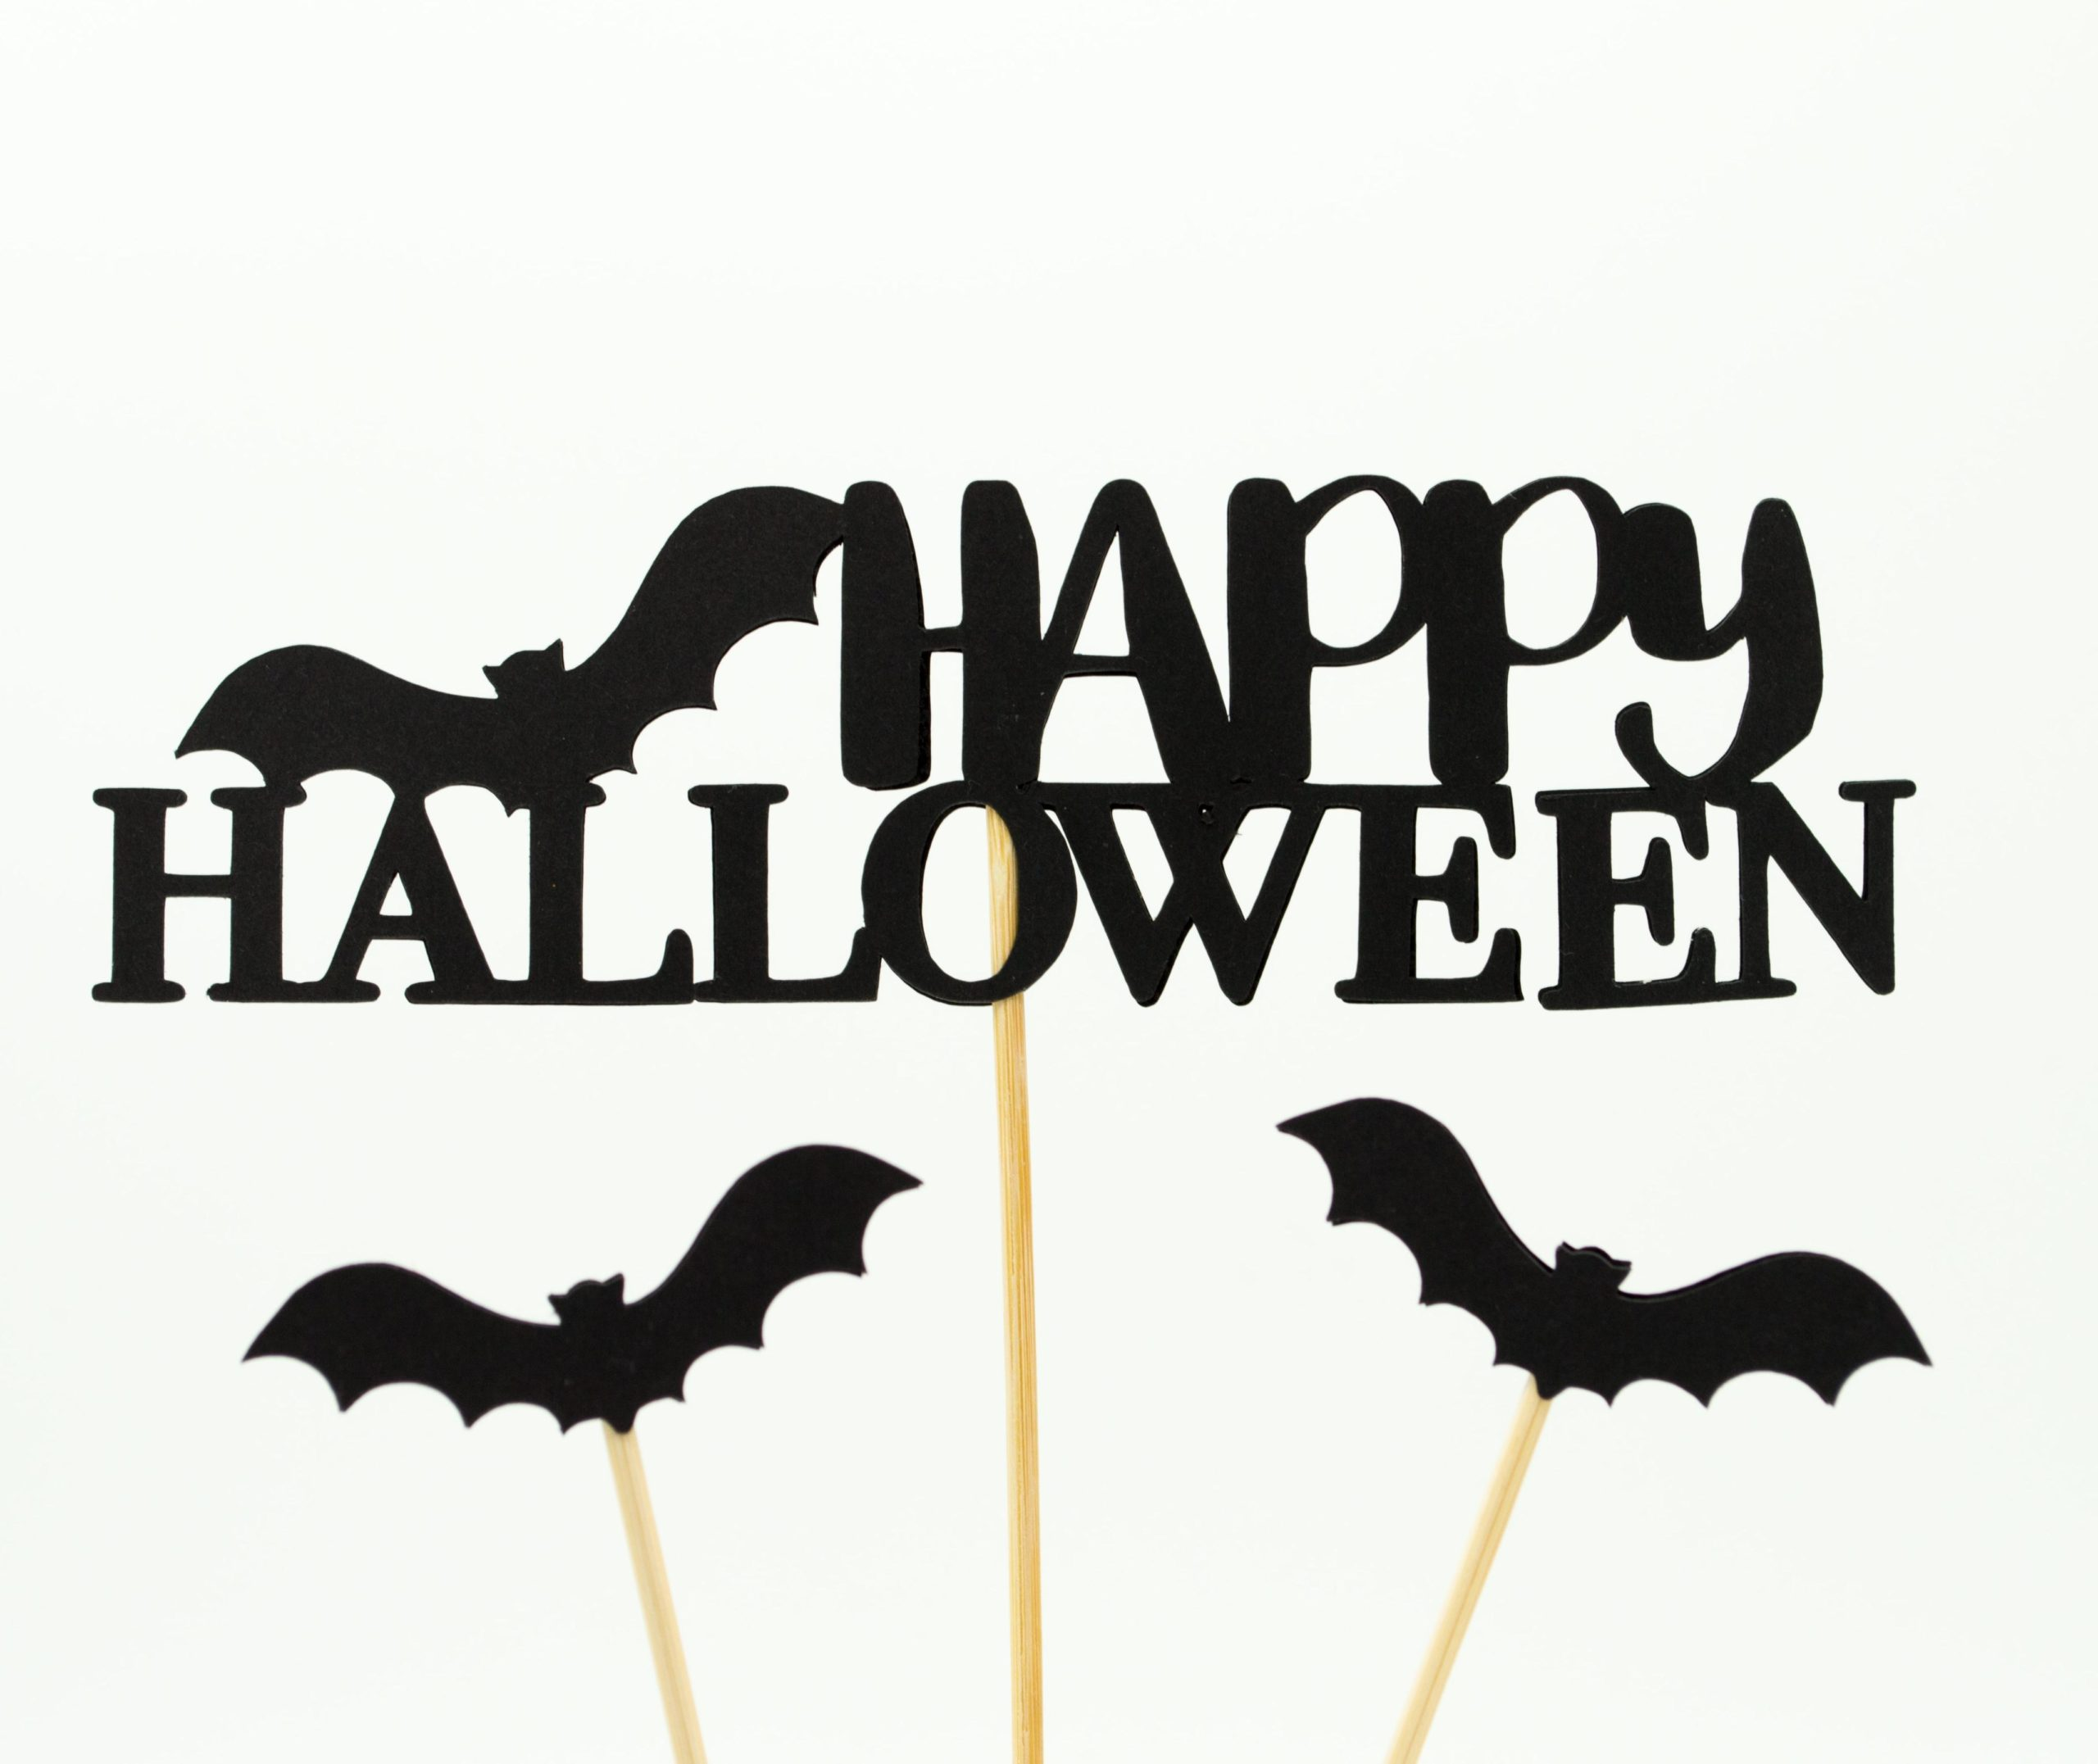 Halloween Unsplash Image